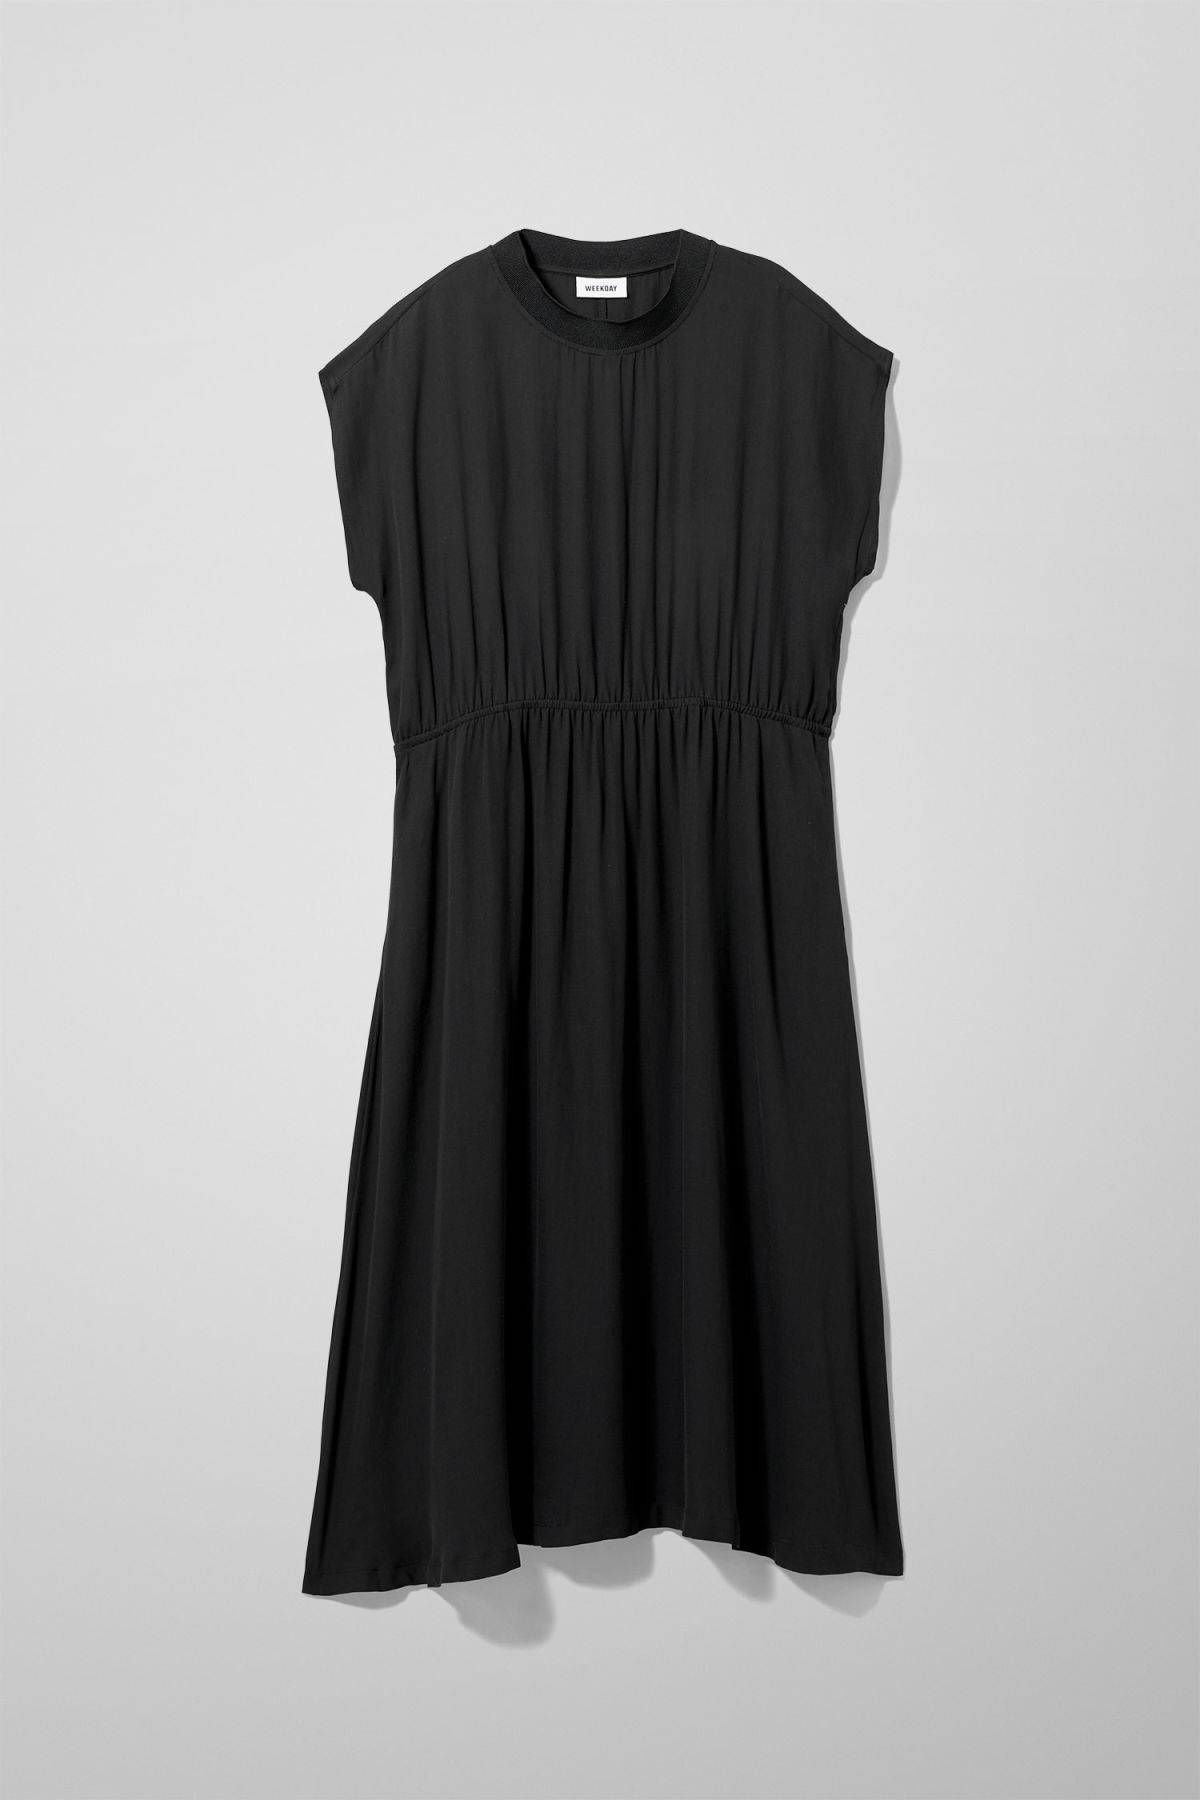 Image of Norma Dress - Black-XS